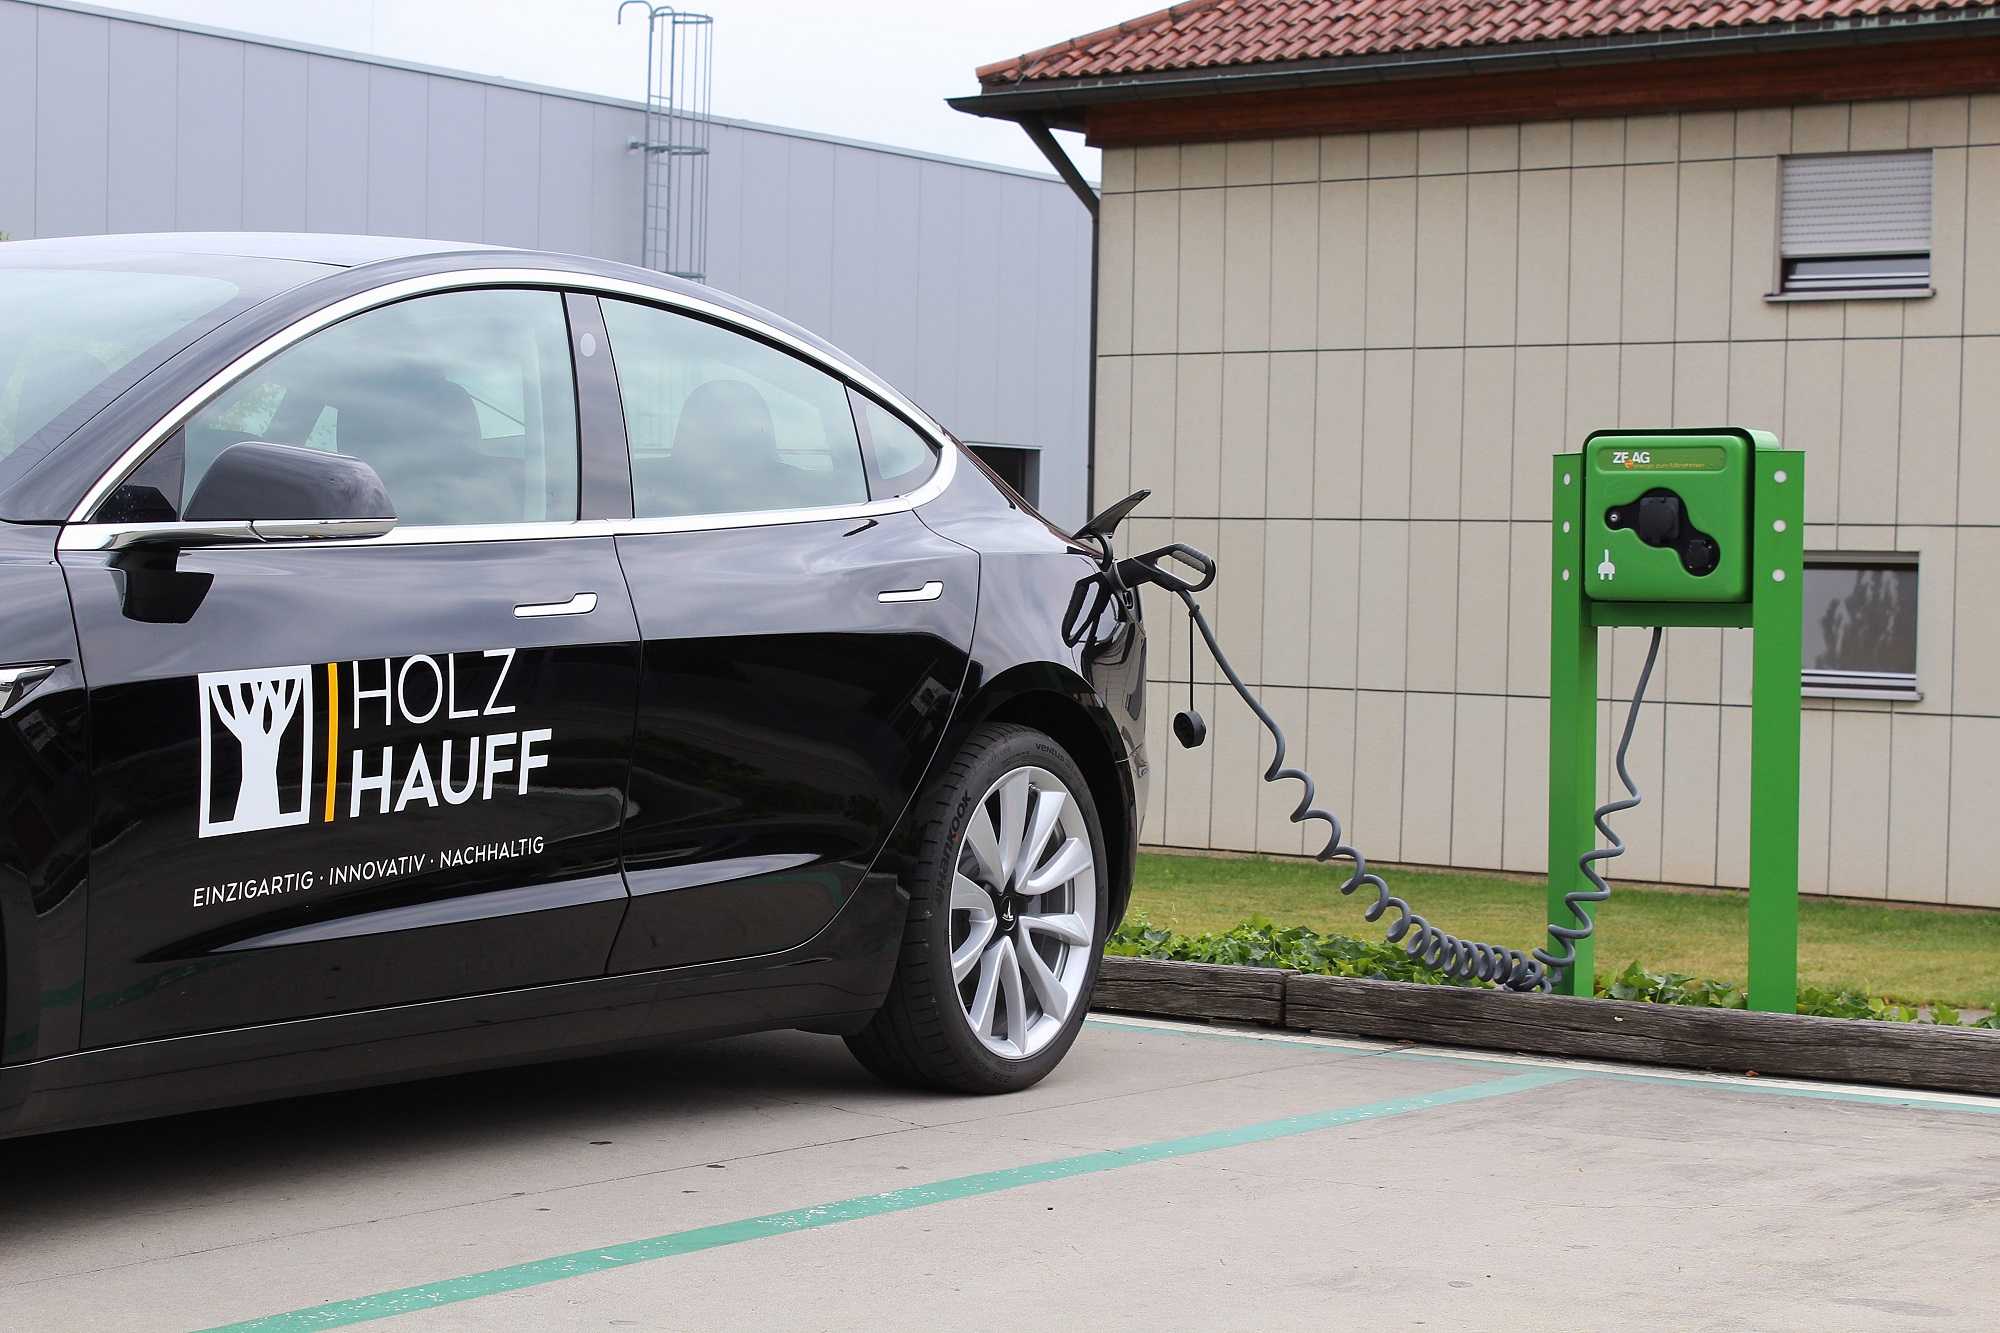 Familienzuwachs: Tesla Elektrofahrzeug | Holz-Hauff GmbH in Leingarten